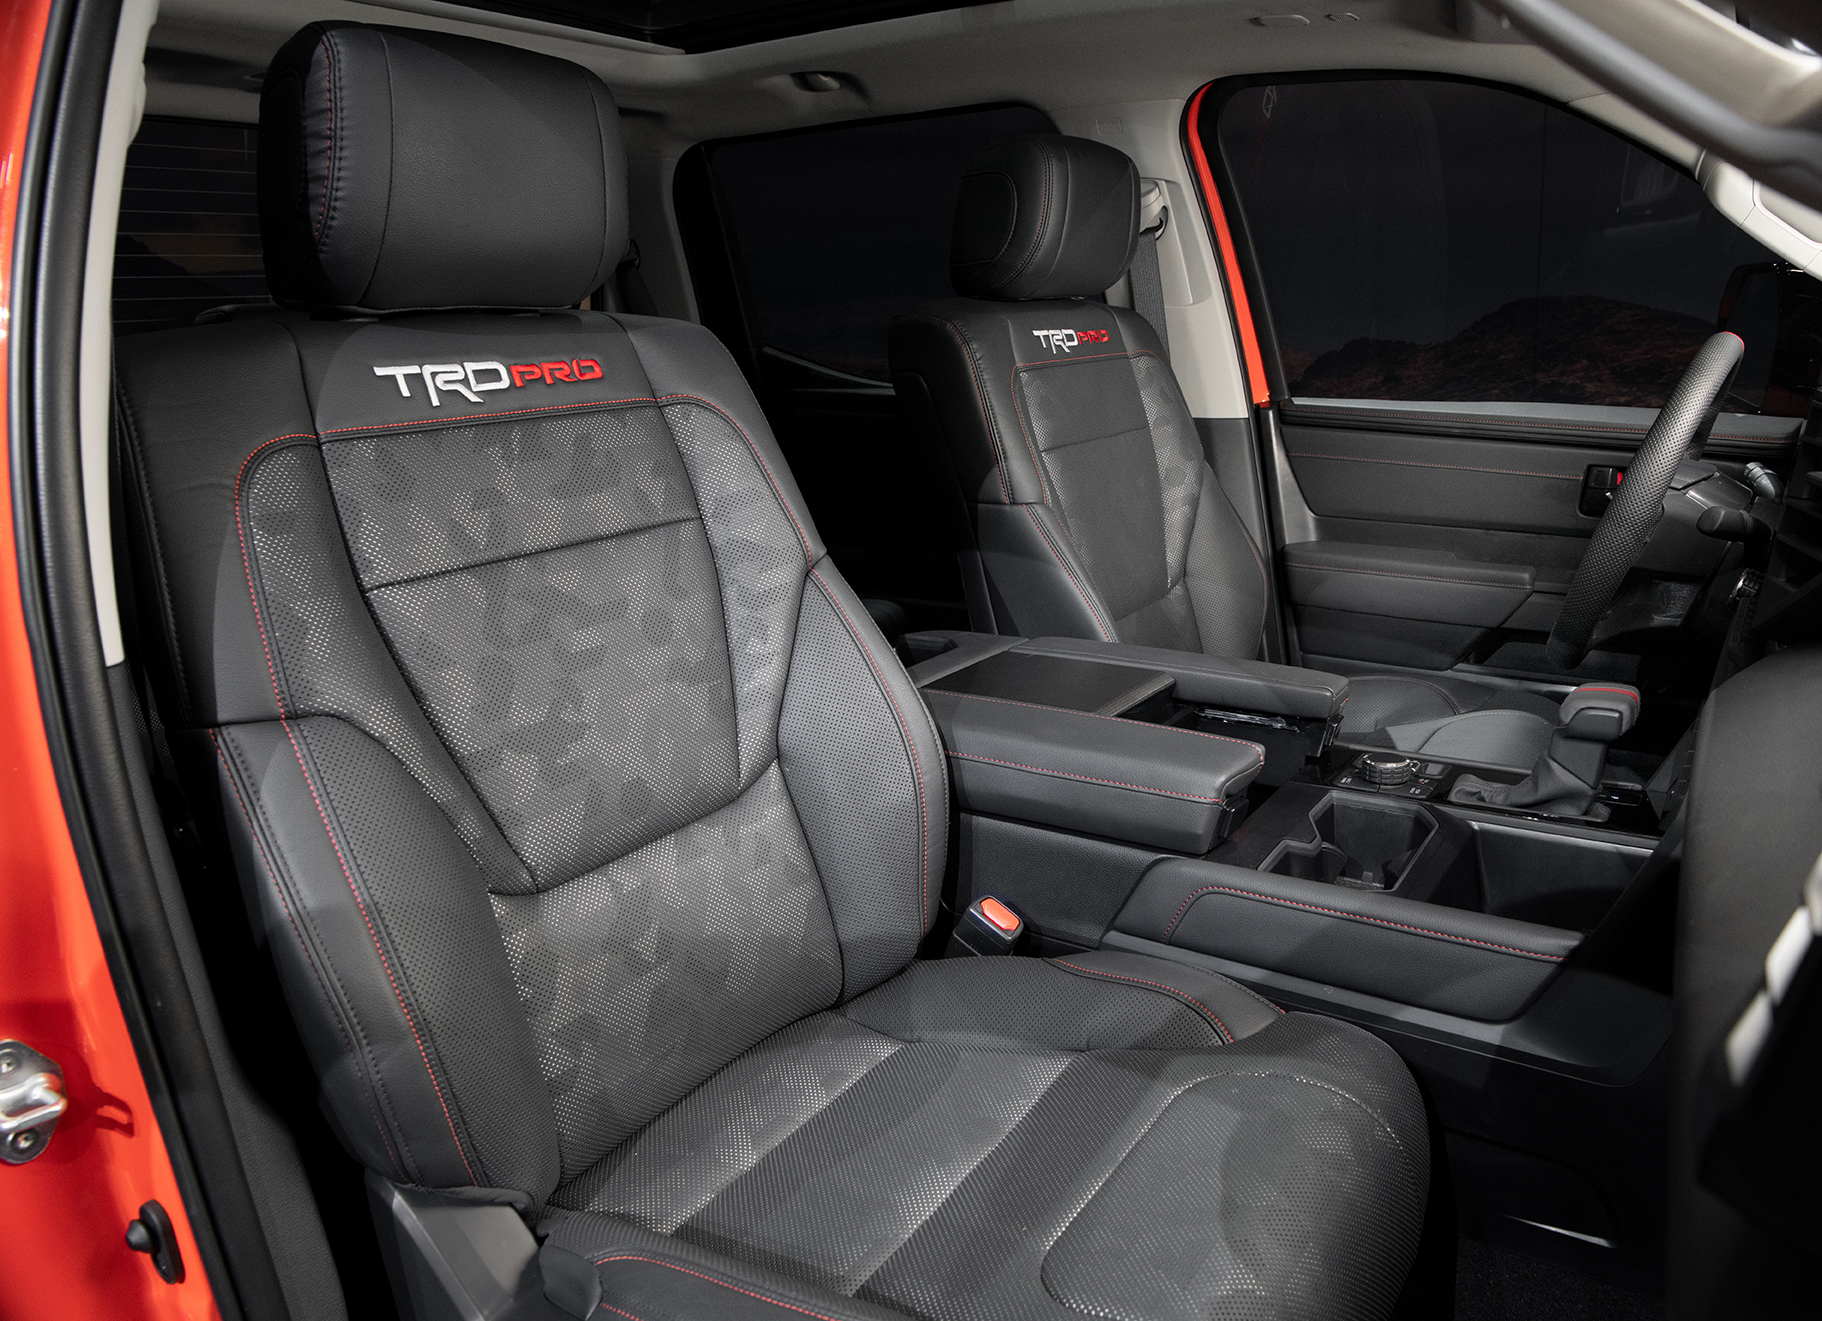 black interior seats of 2022 Toyota Tundra TRD Pro in Solar Octane orange